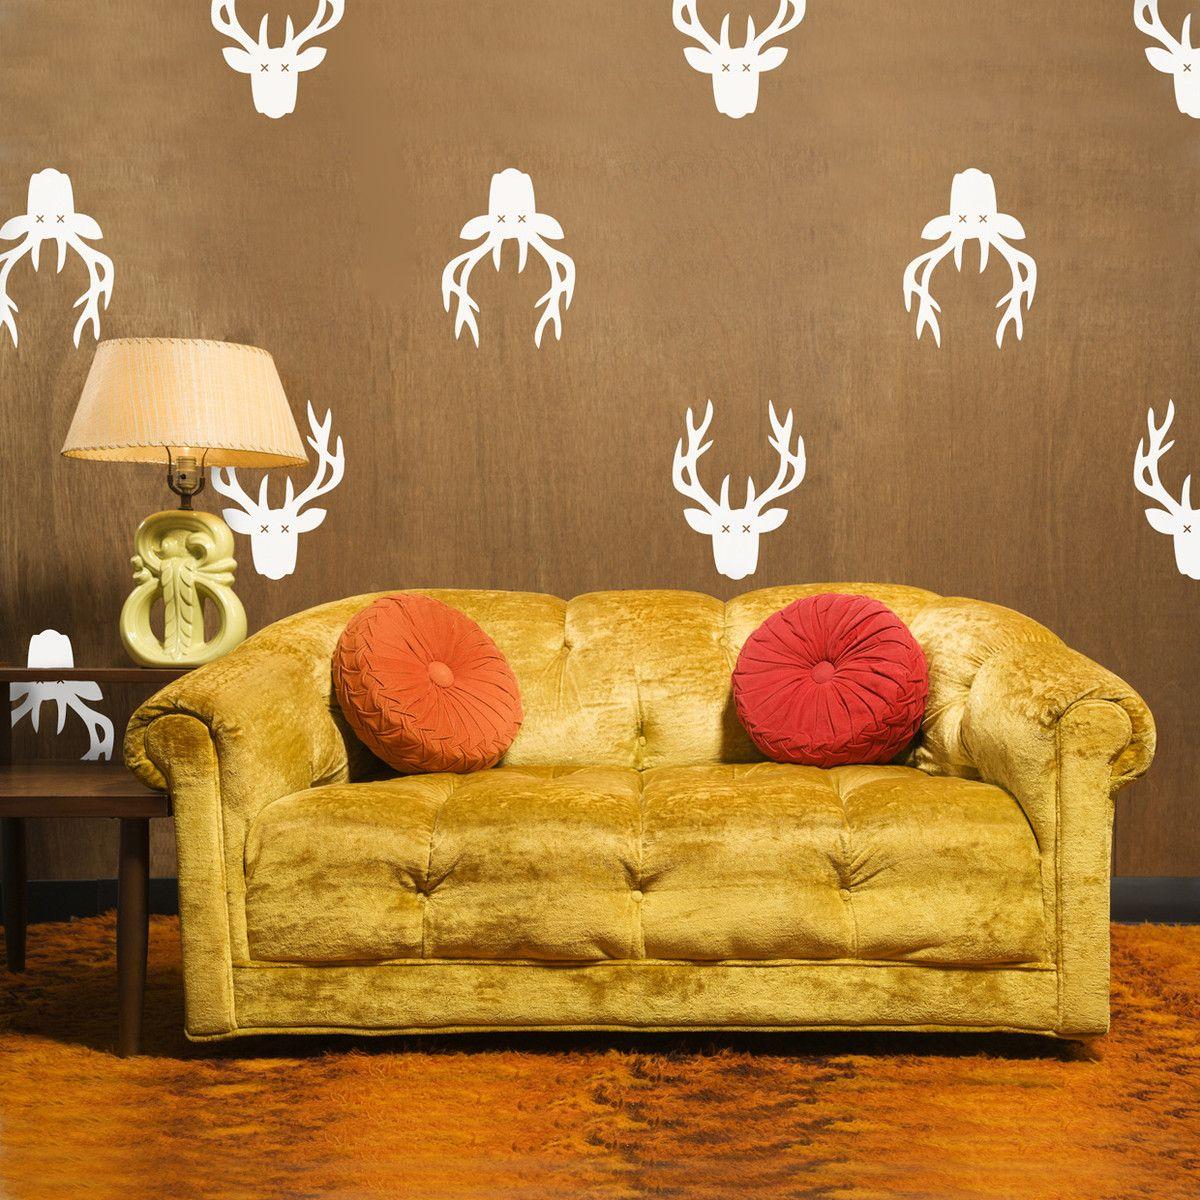 Fab.com   Deer Trophy 13x9.6 White   Home decor   Pinterest